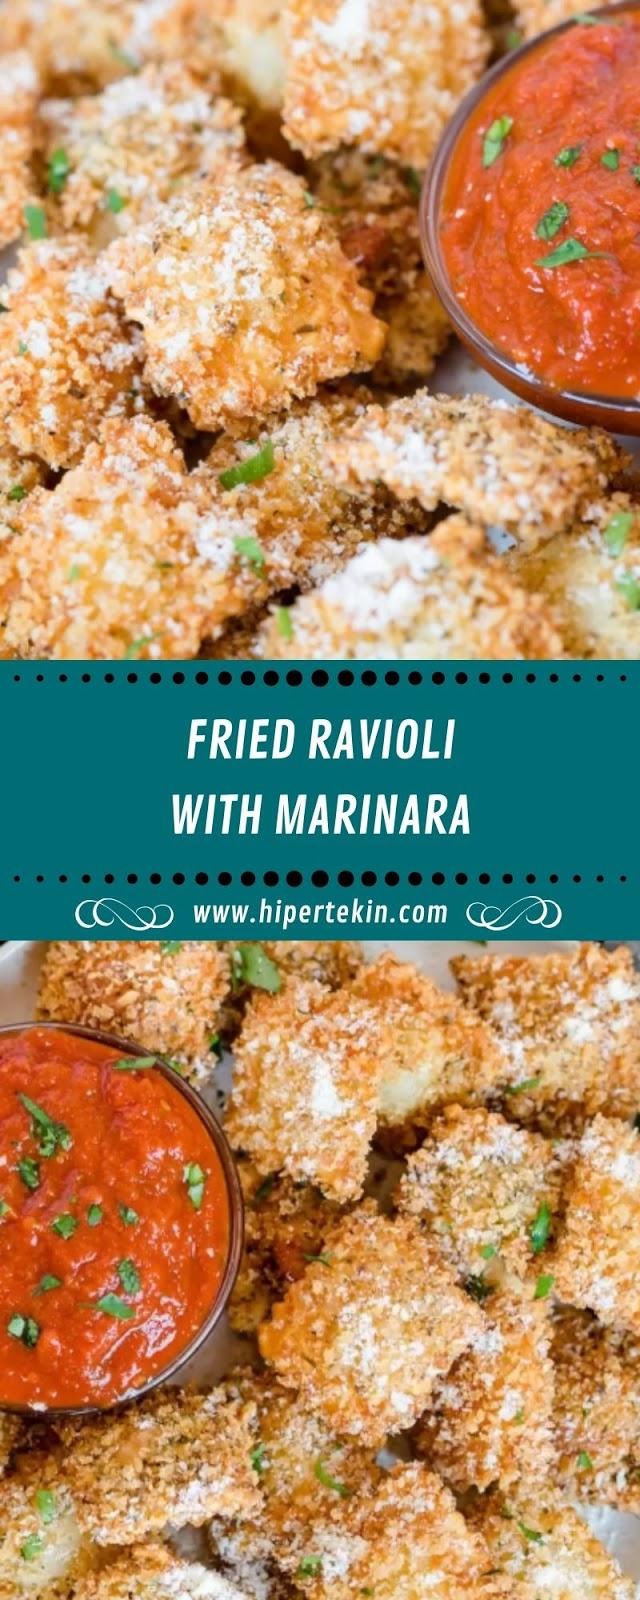 FRIED RAVIOLI WITH MARINARA